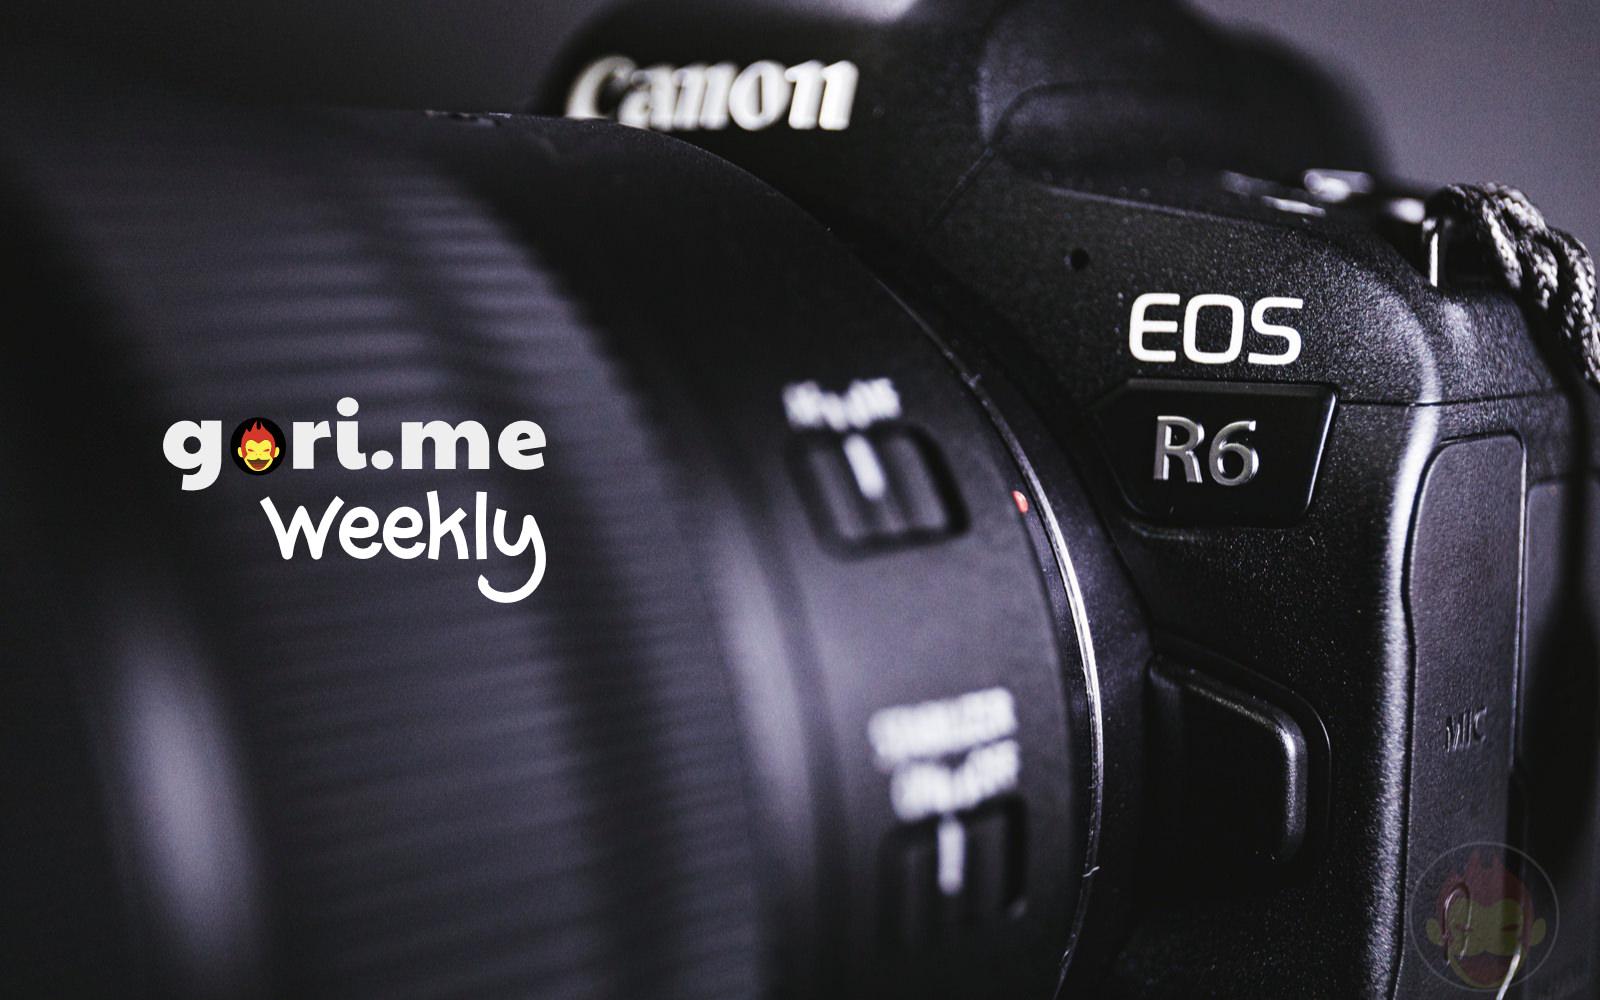 GoriMe Weekly Canon EOSR6